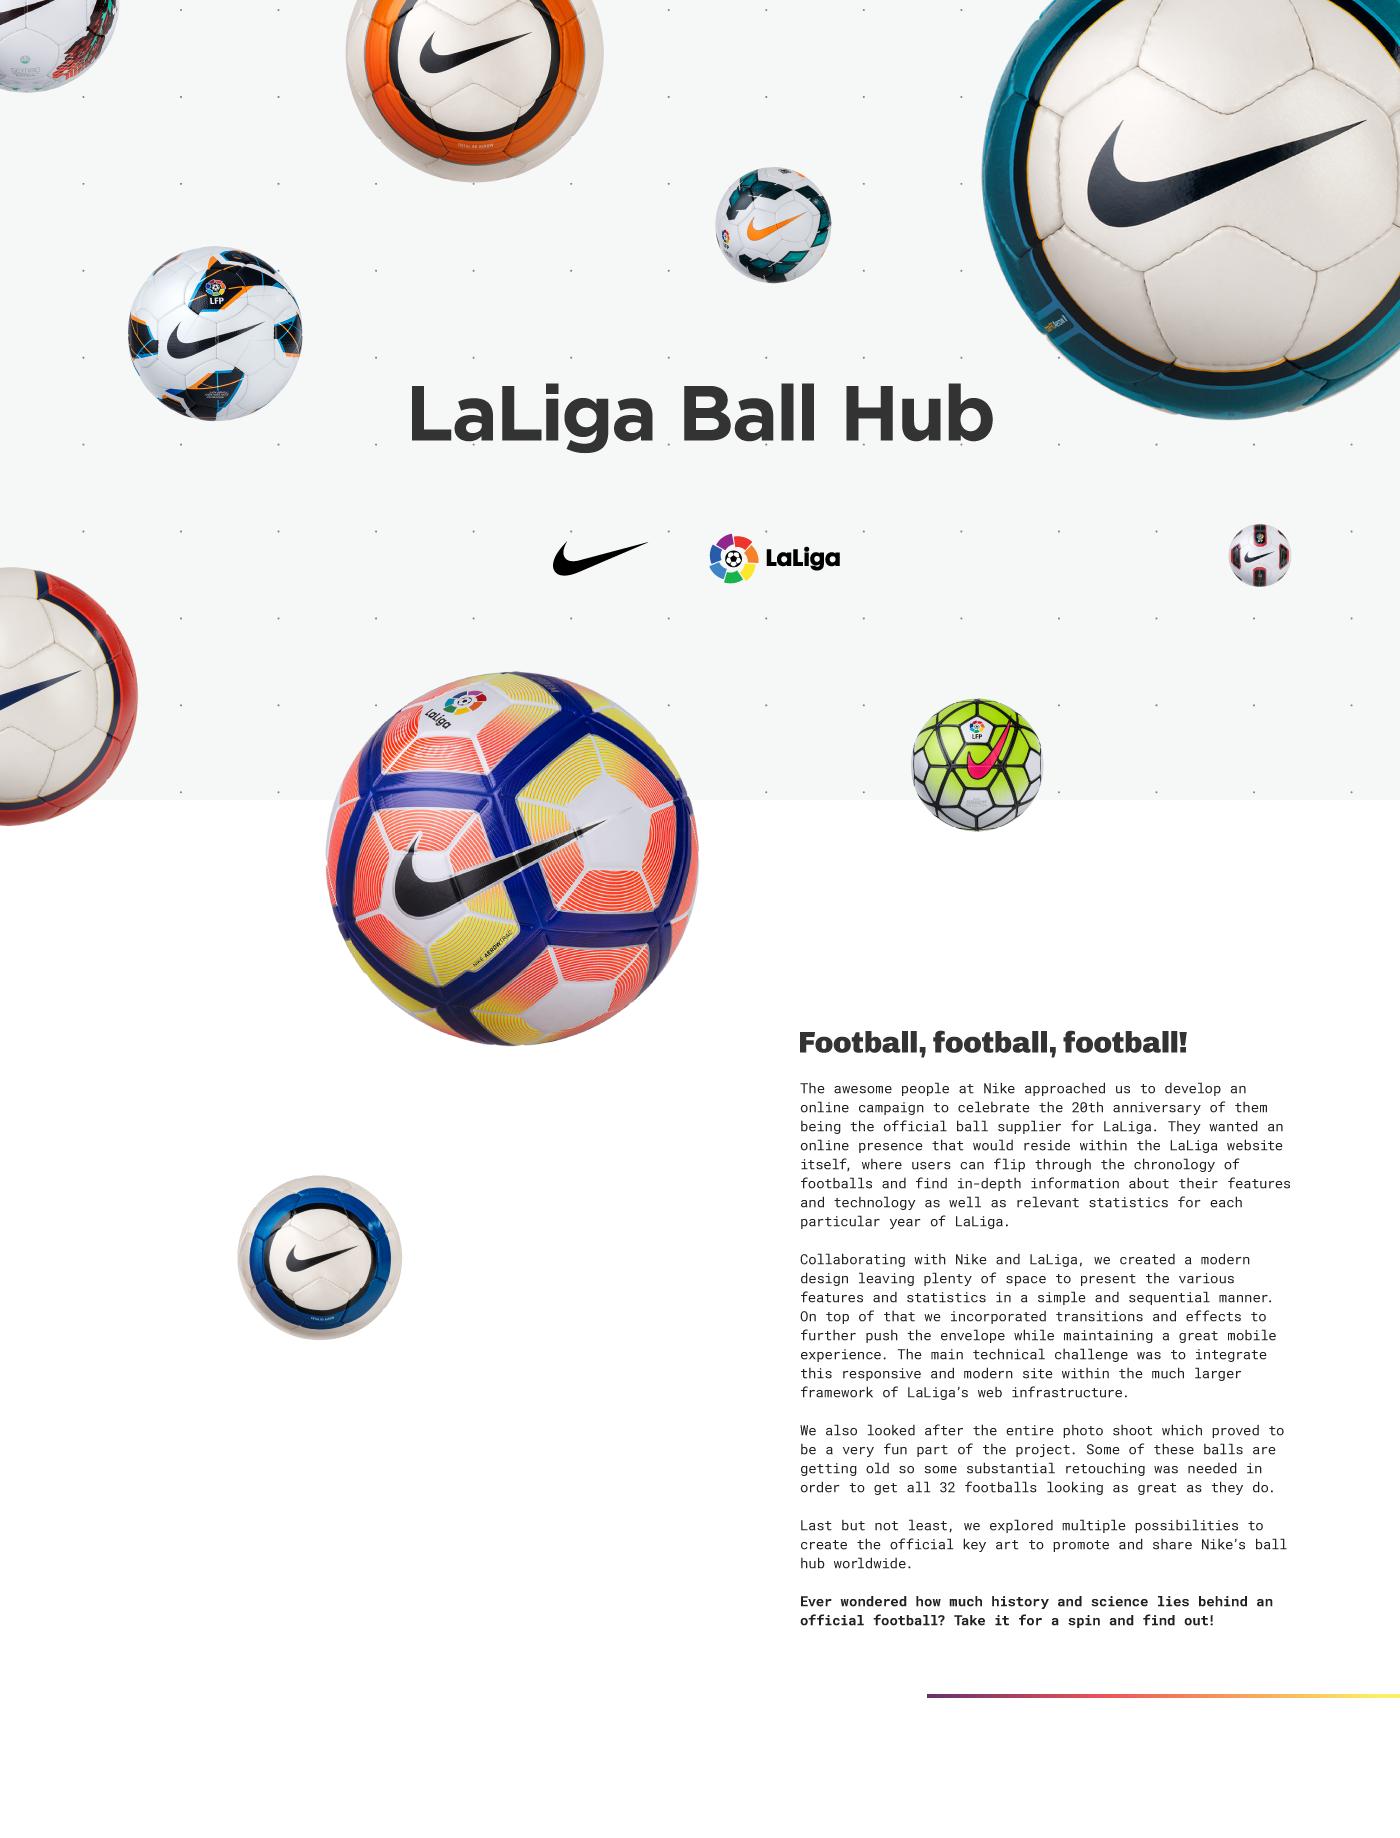 18c3dd7fcd3 Nike - LaLiga Ball Hub - Website on Behance